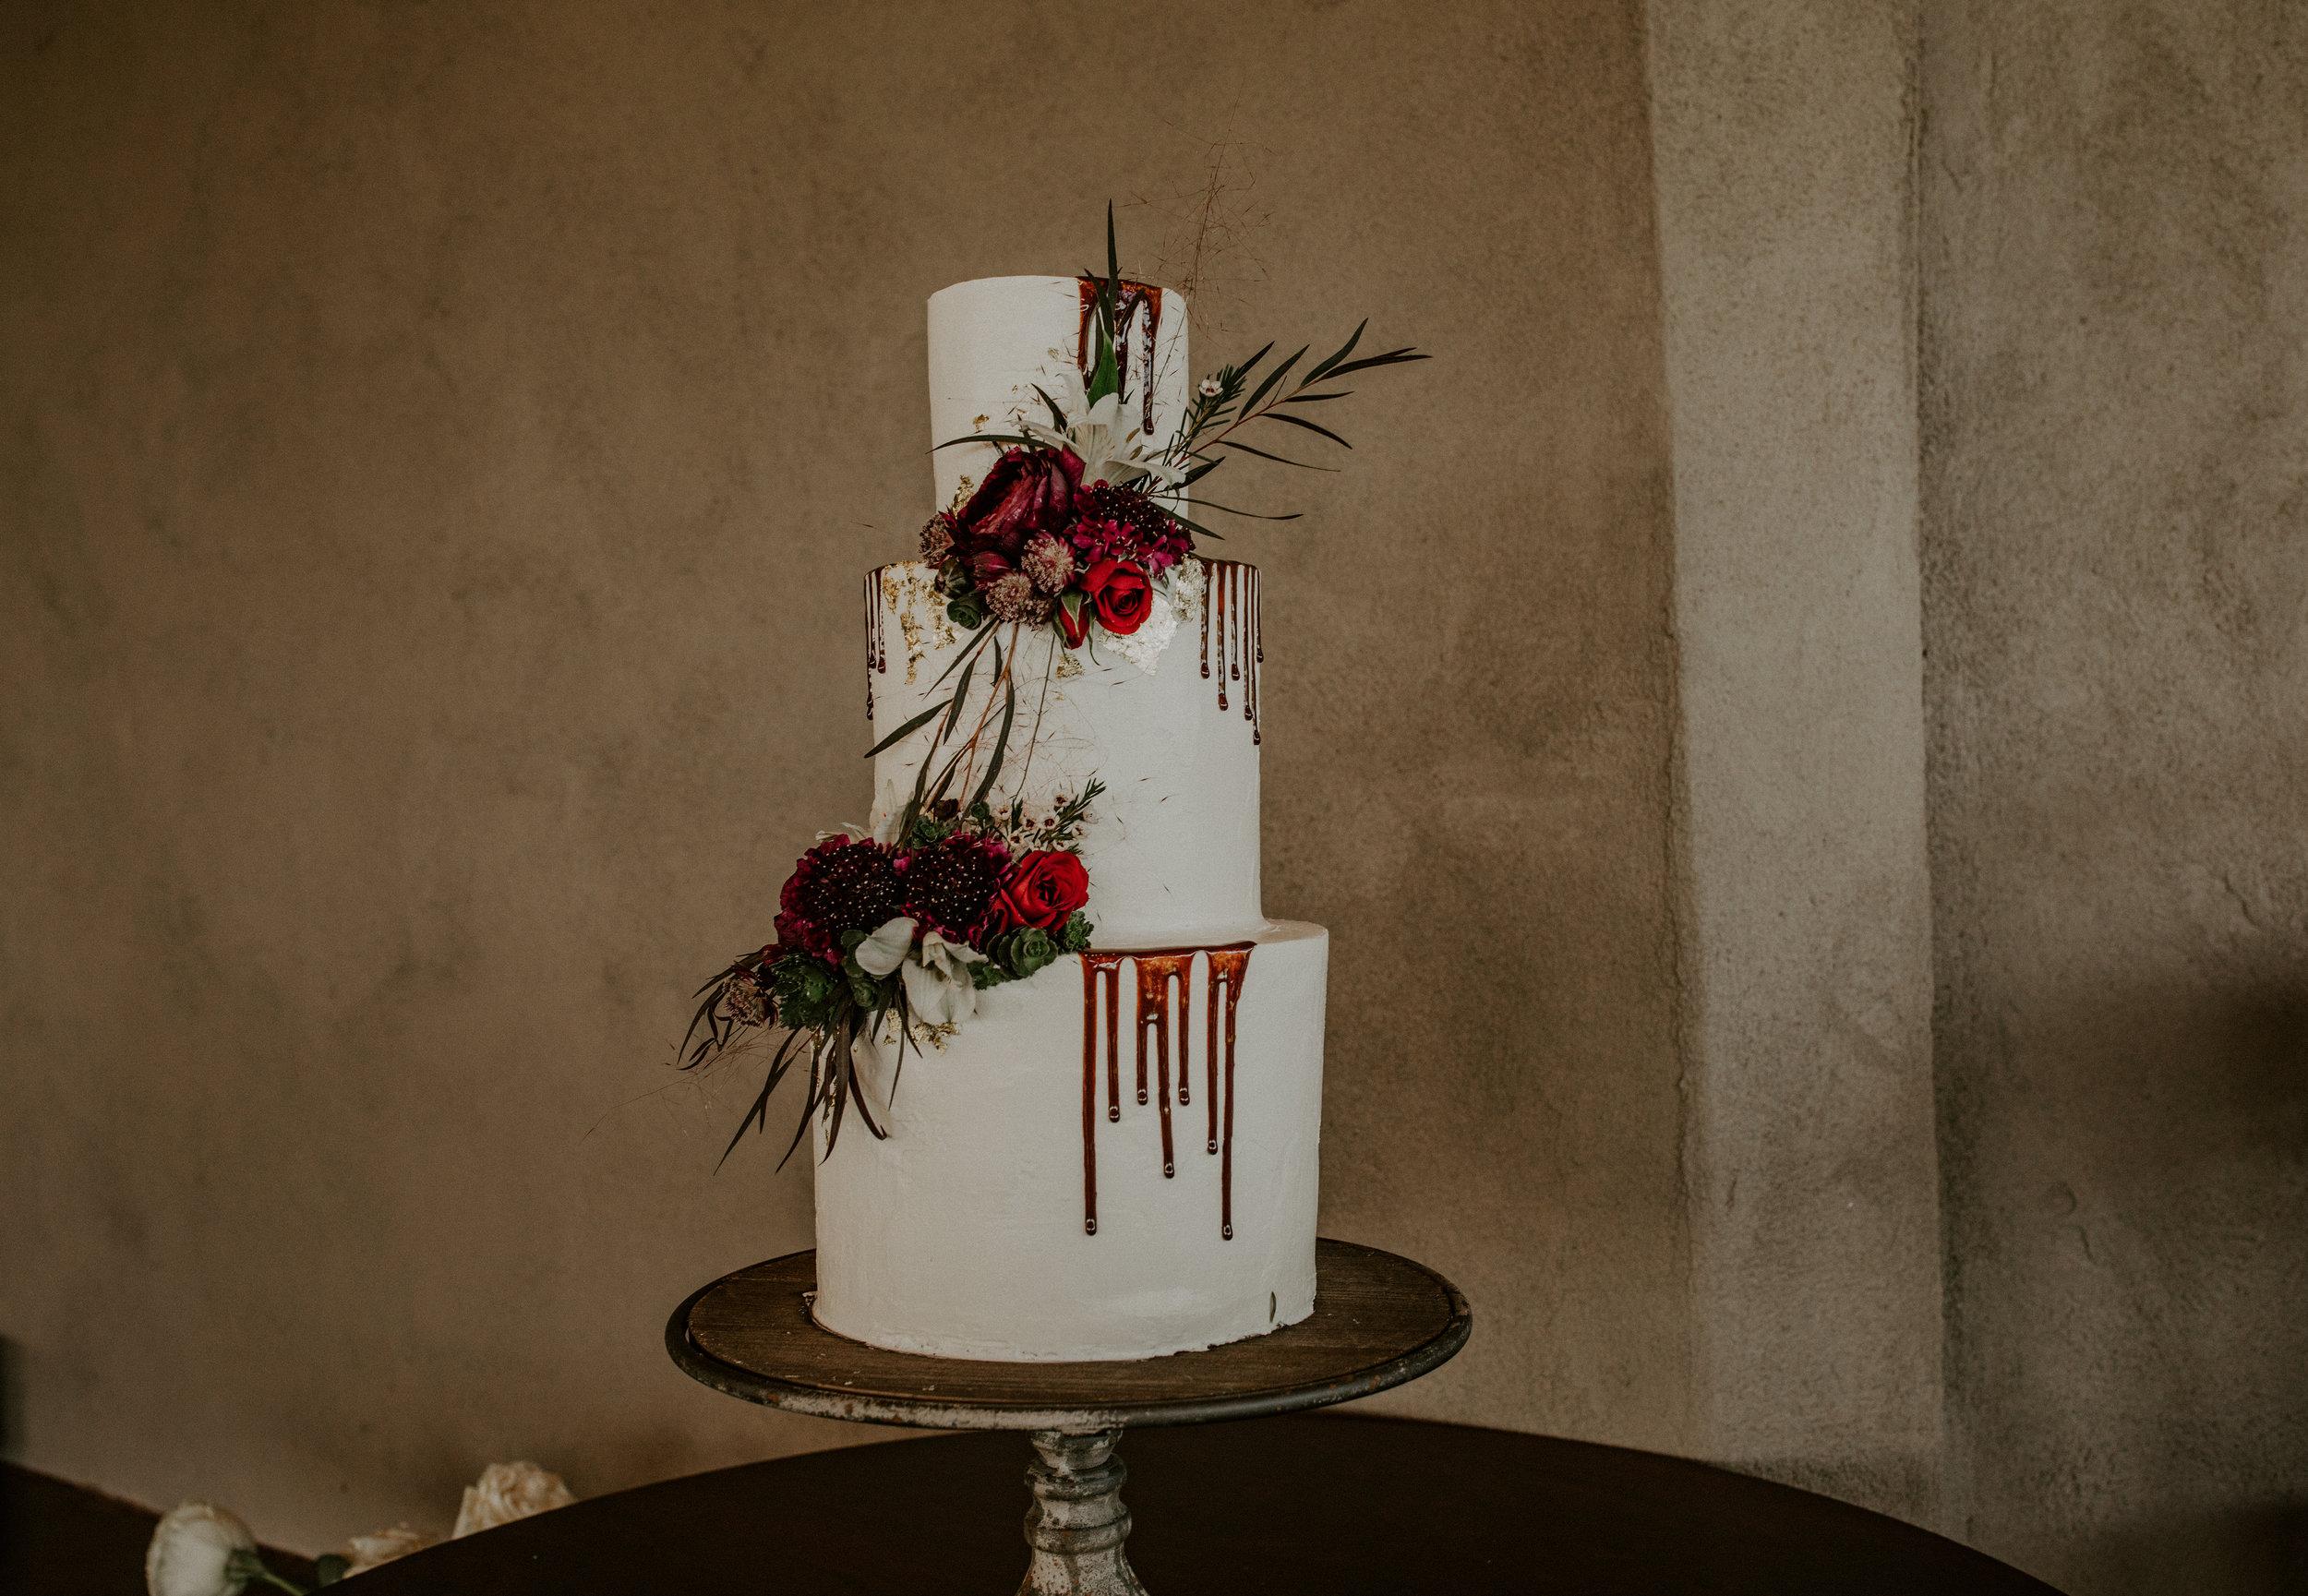 Point Lookout Vineyards Hendersonville North Carolina -Wedding-Renee and Jason-11.JPG